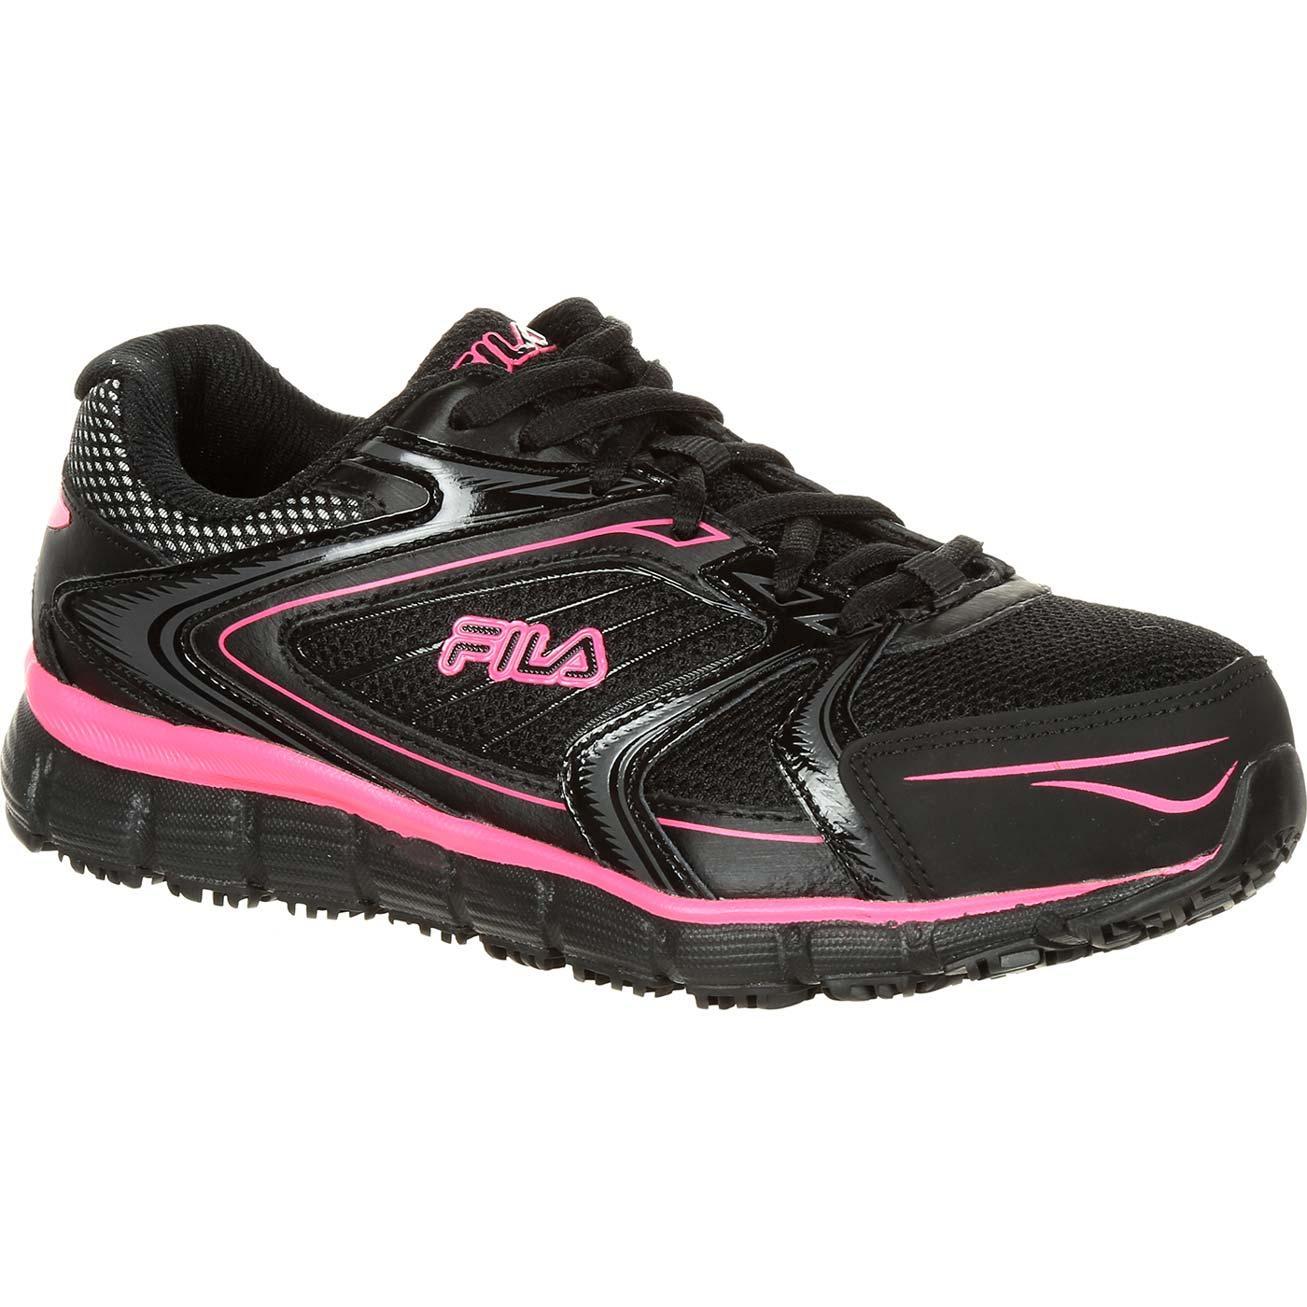 94fff53d59 Fila Memory Reckoning 7 Women's Steel Toe Slip-Resistant Work Athletic Shoe